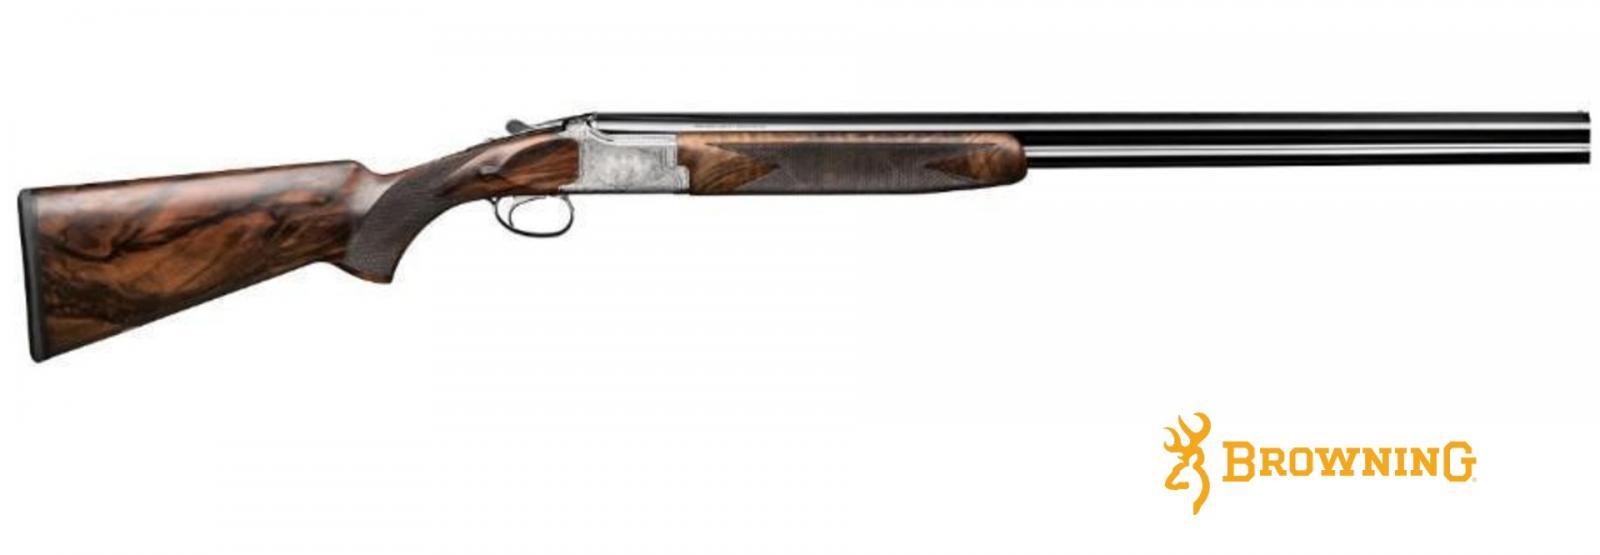 Fusil BROWING B525 CROWN LUXE Édition Limitée Cal 20/76